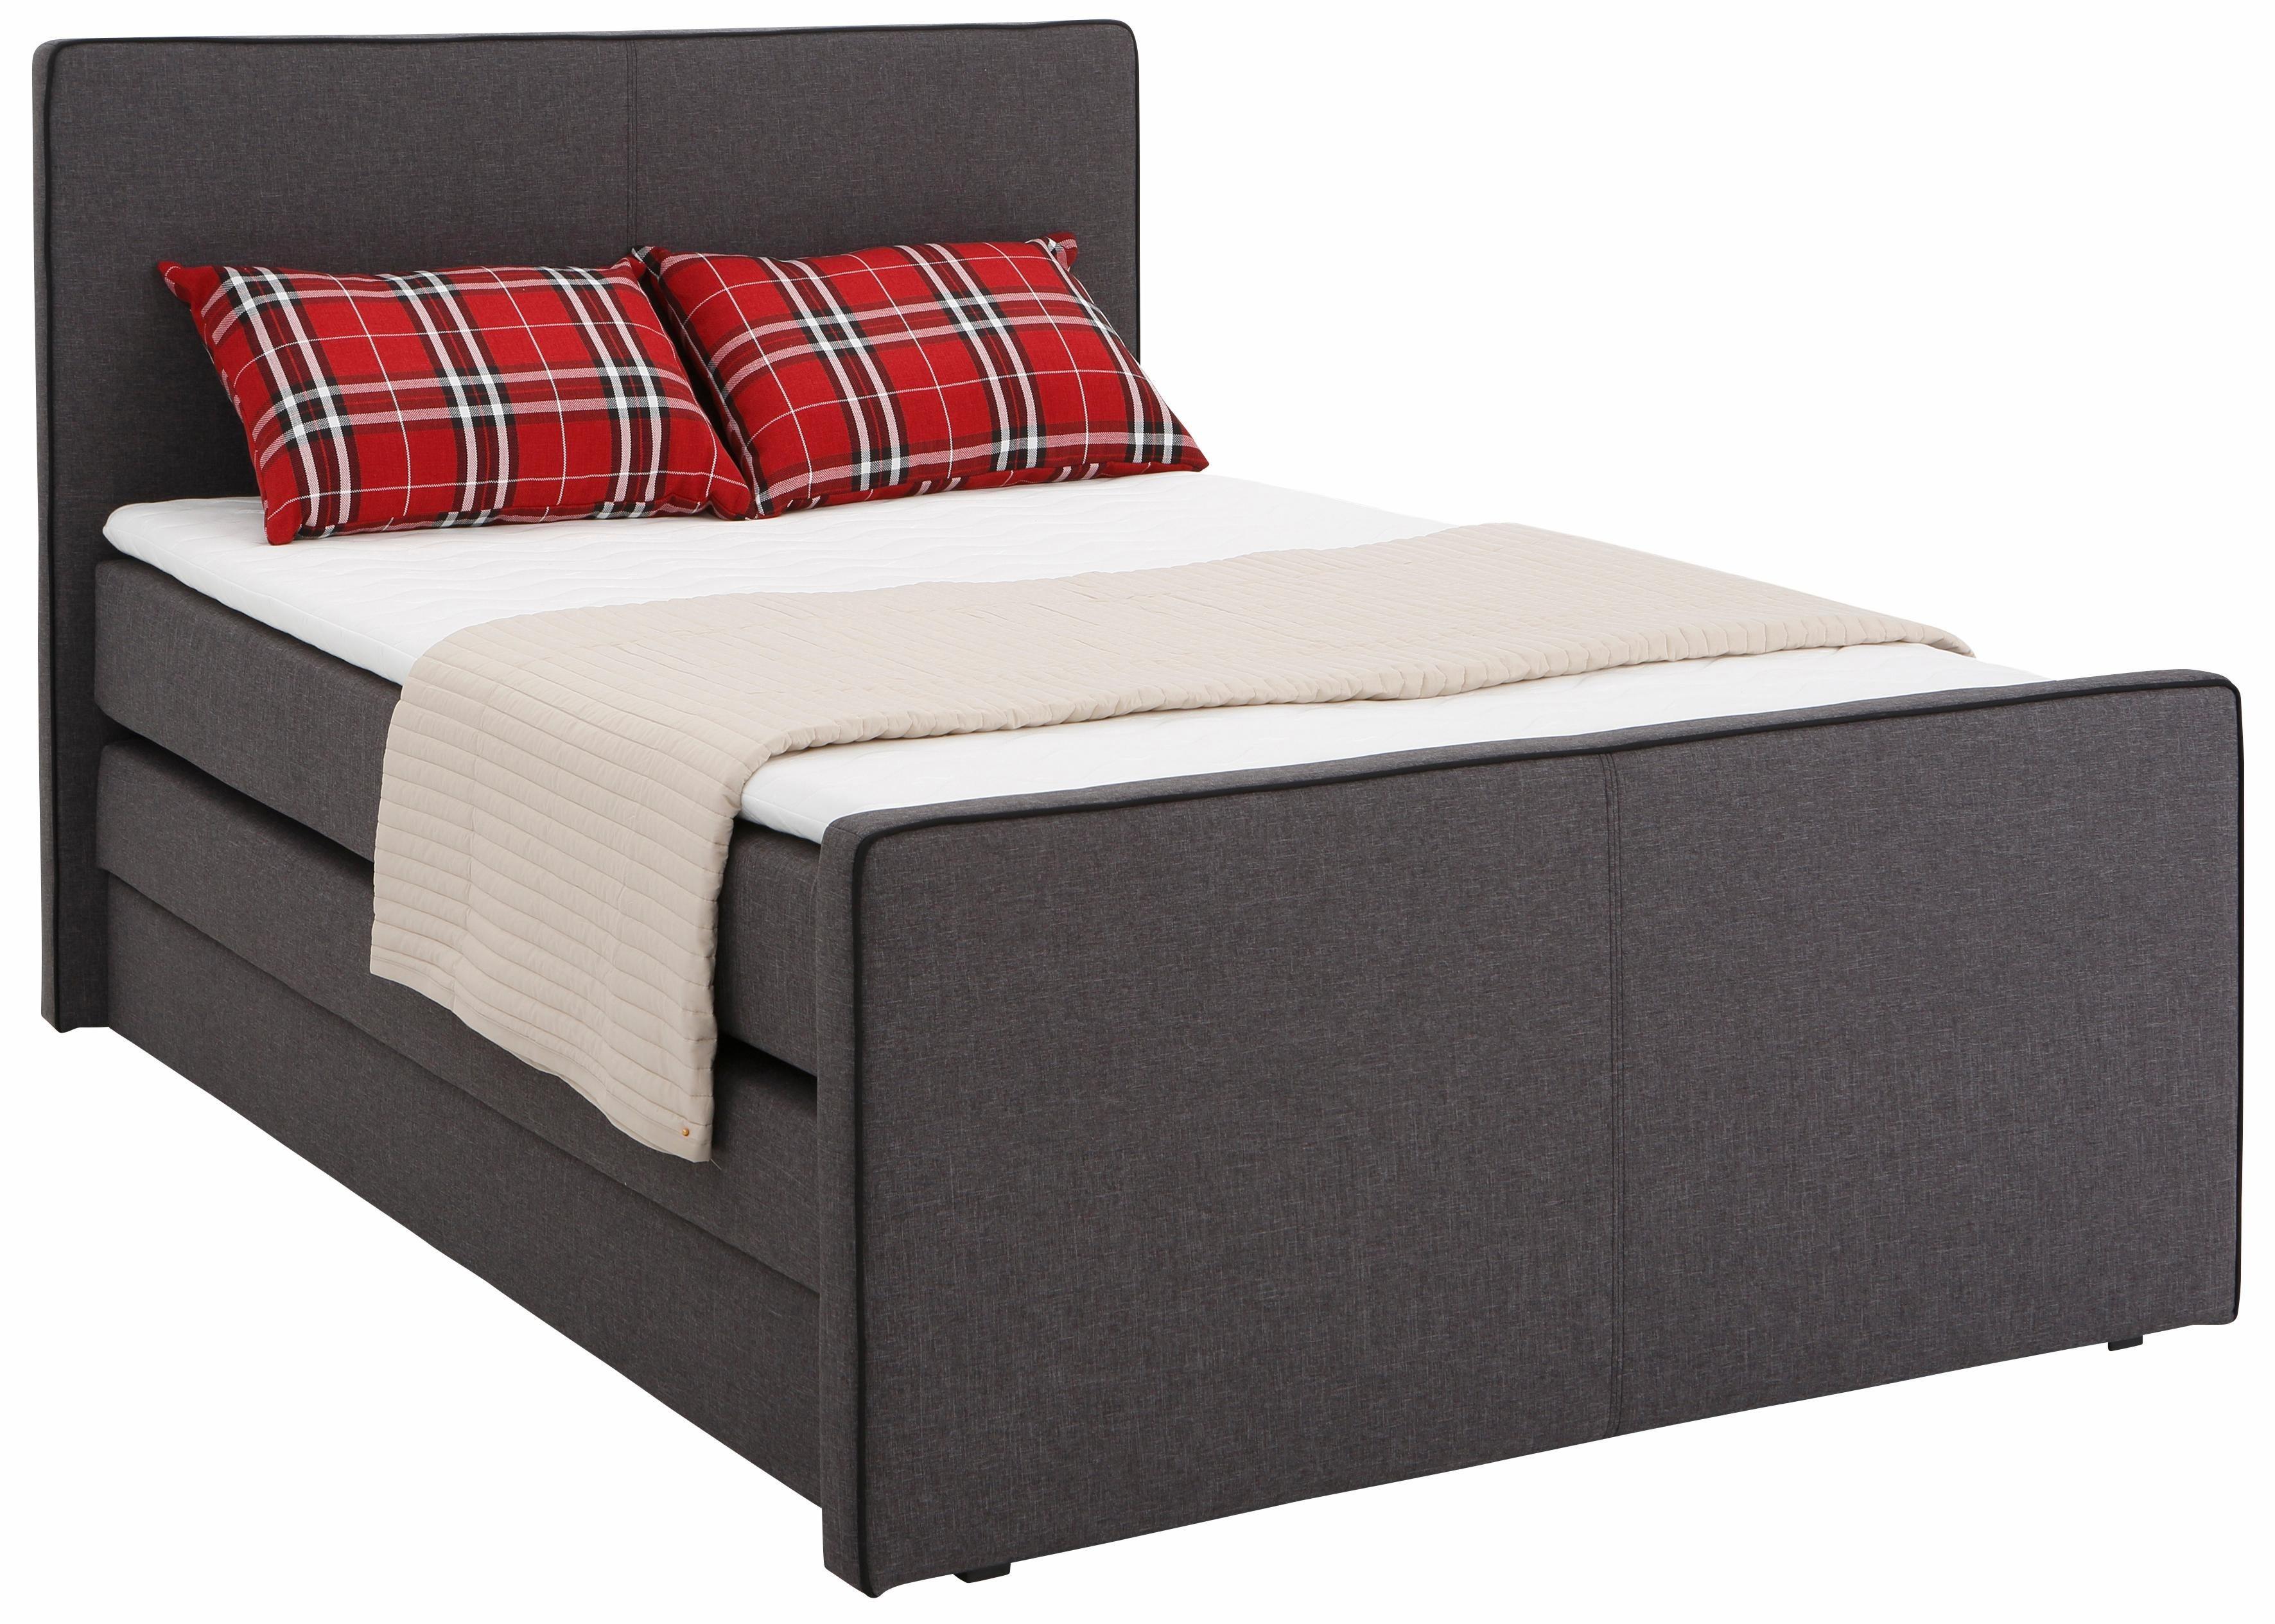 50 sparen boxspringbett memphis von home affaire ab 799 99 cherry m bel otto. Black Bedroom Furniture Sets. Home Design Ideas